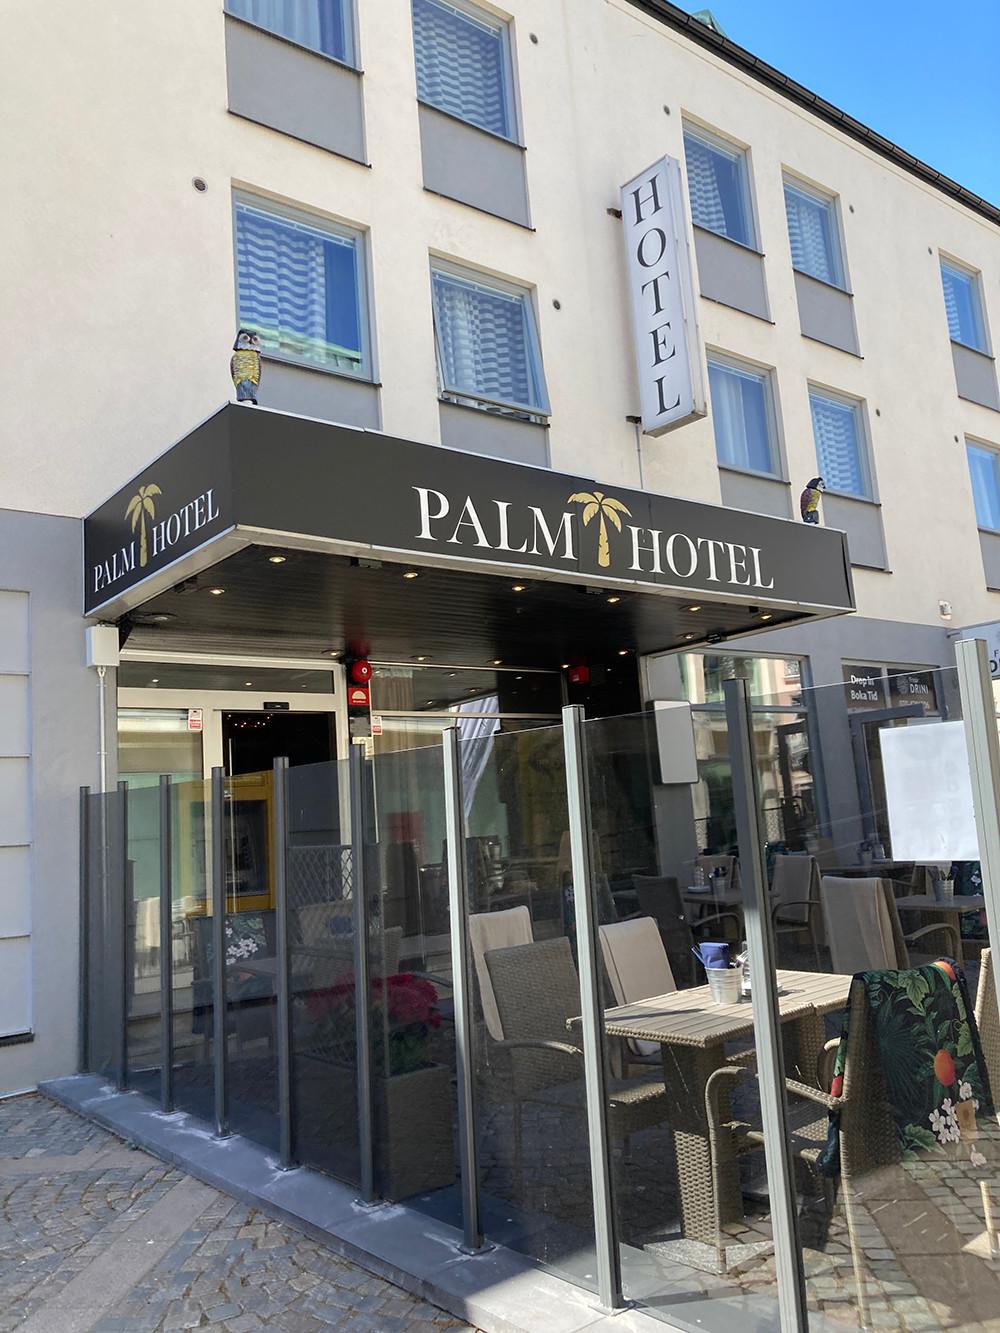 Entrén till Palm Hotell i Trelleborg